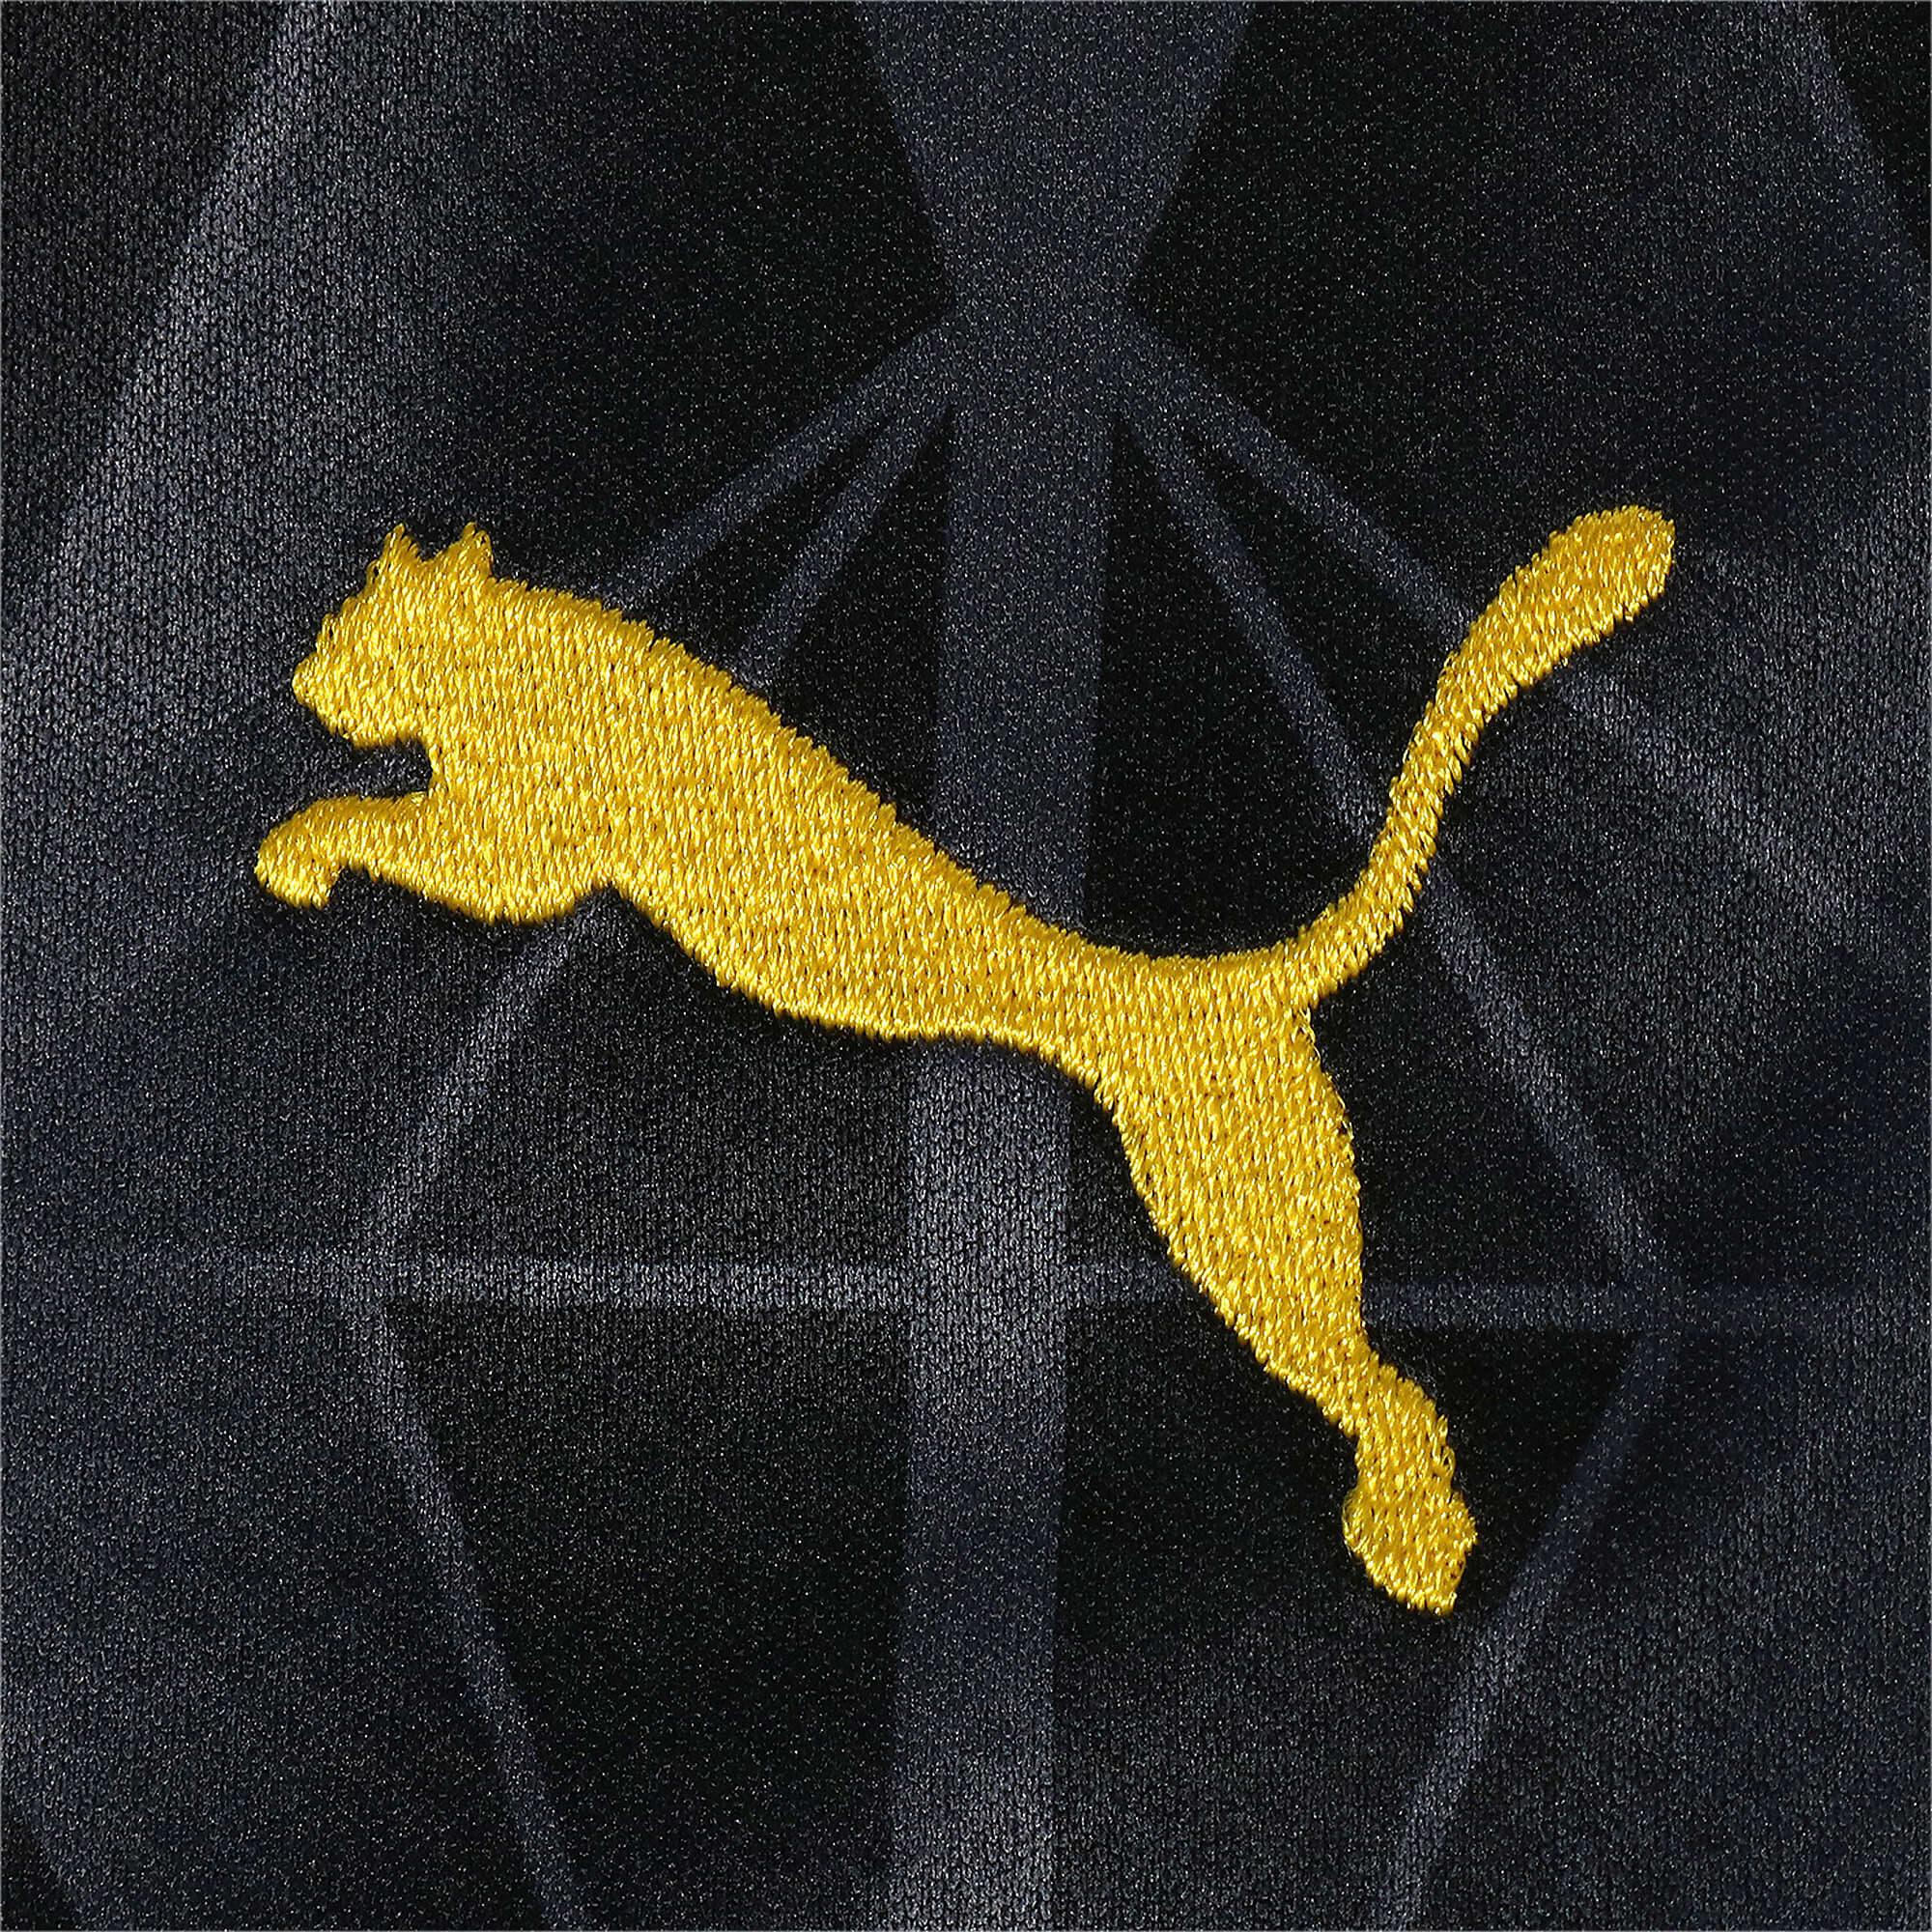 Thumbnail 4 of ドルトムント BVB SS カップ レプリカシャツ (半袖), Cyber Yellow-Puma Black, medium-JPN